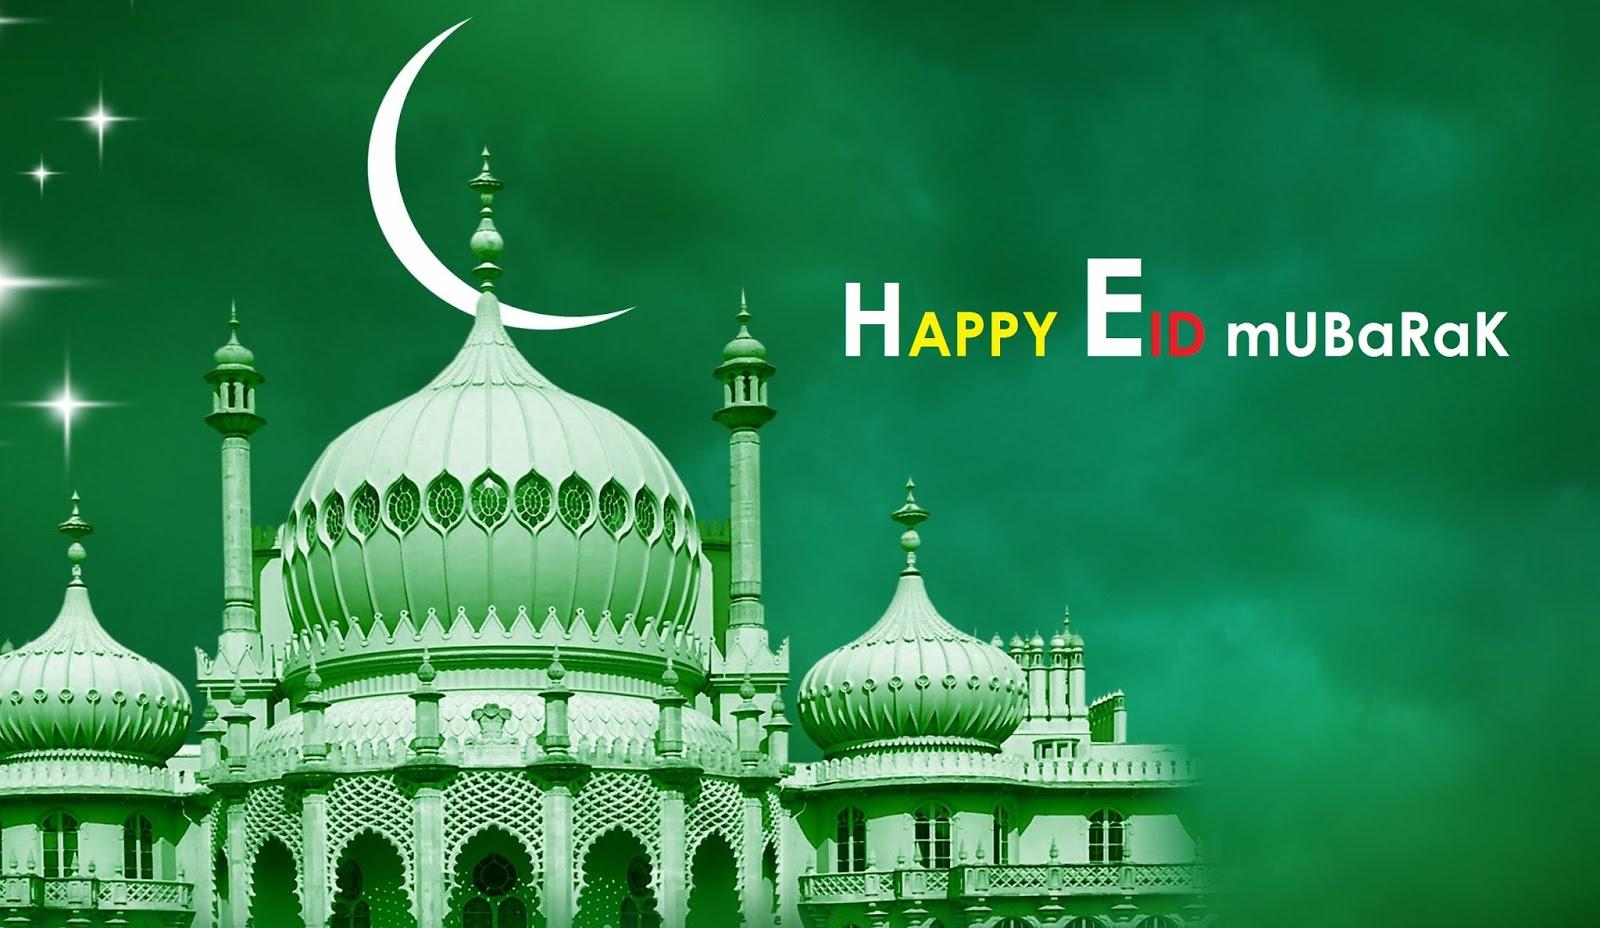 Wallpaper download eid - Eid Mubarak Wishes